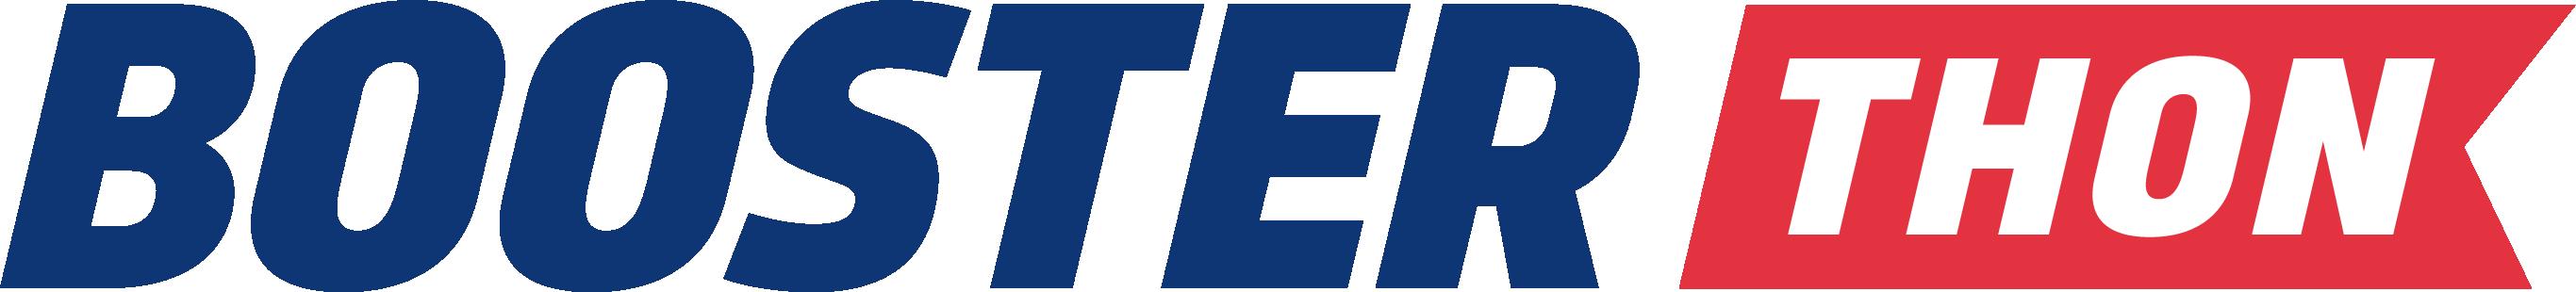 Boosterthon Company Logo